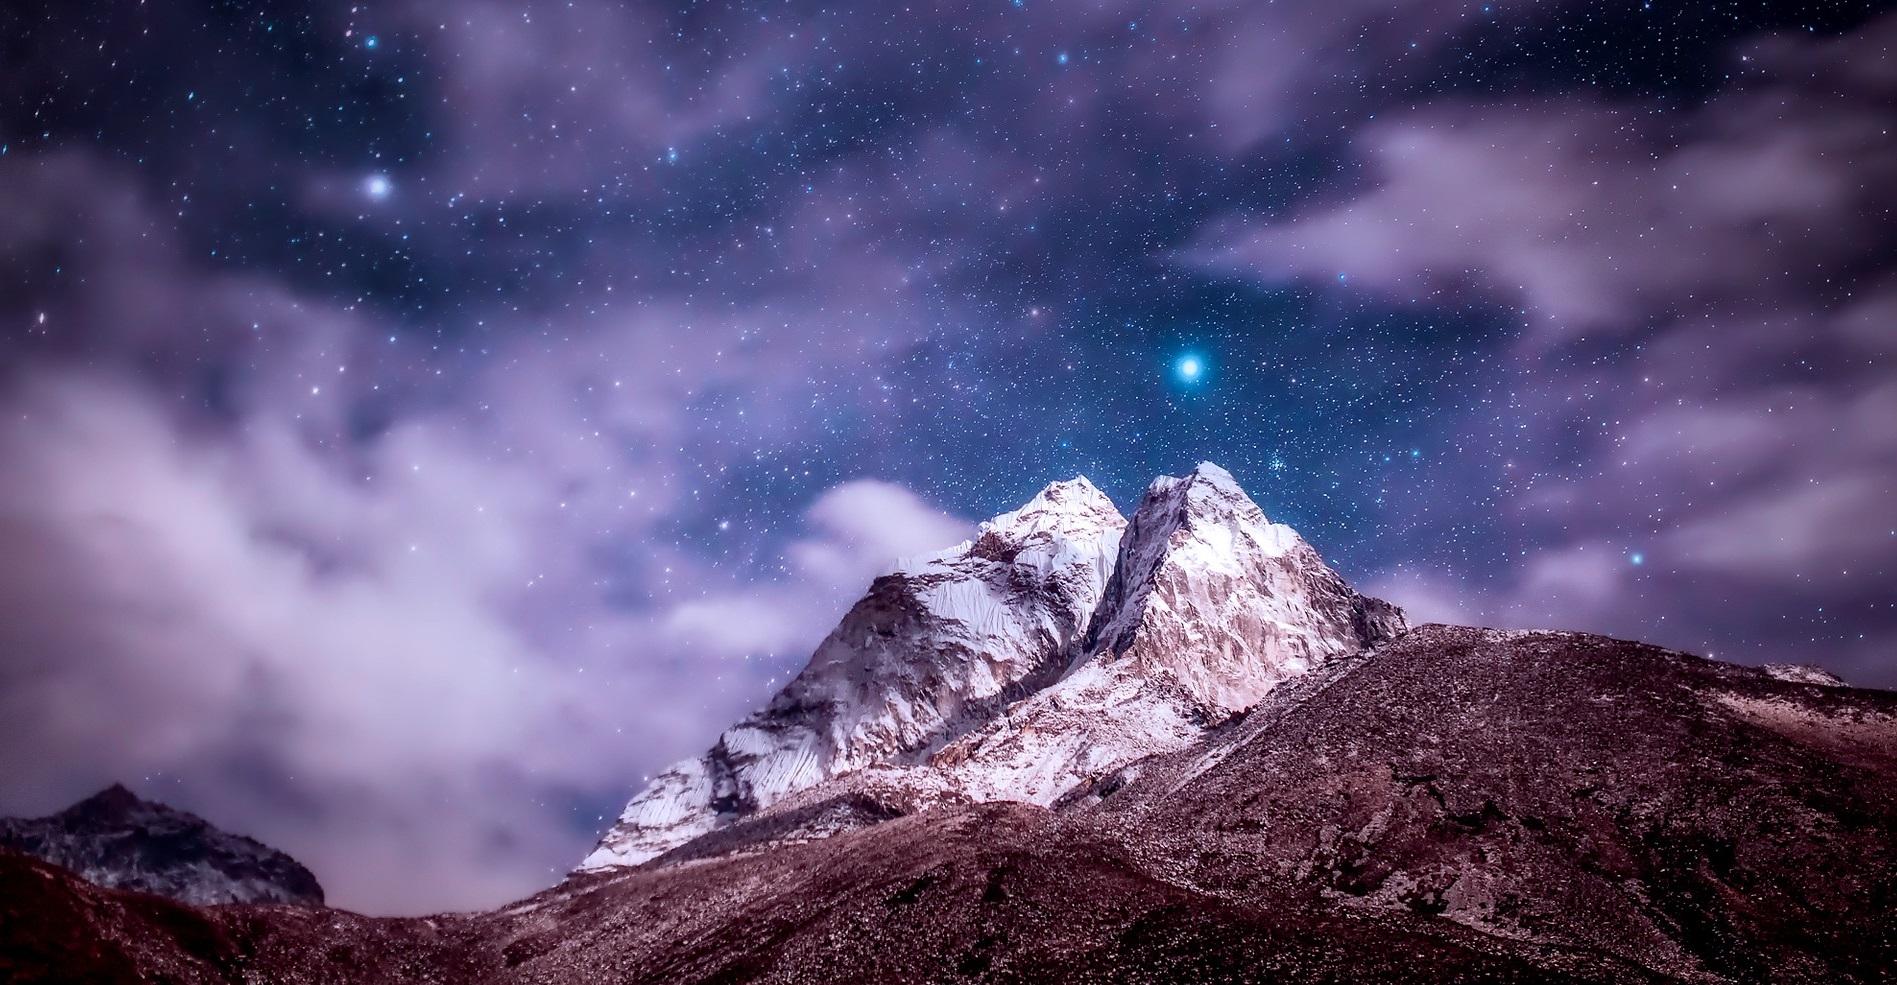 Himalayas at Night | Backpacking with Bacon | Budget Travel Blog